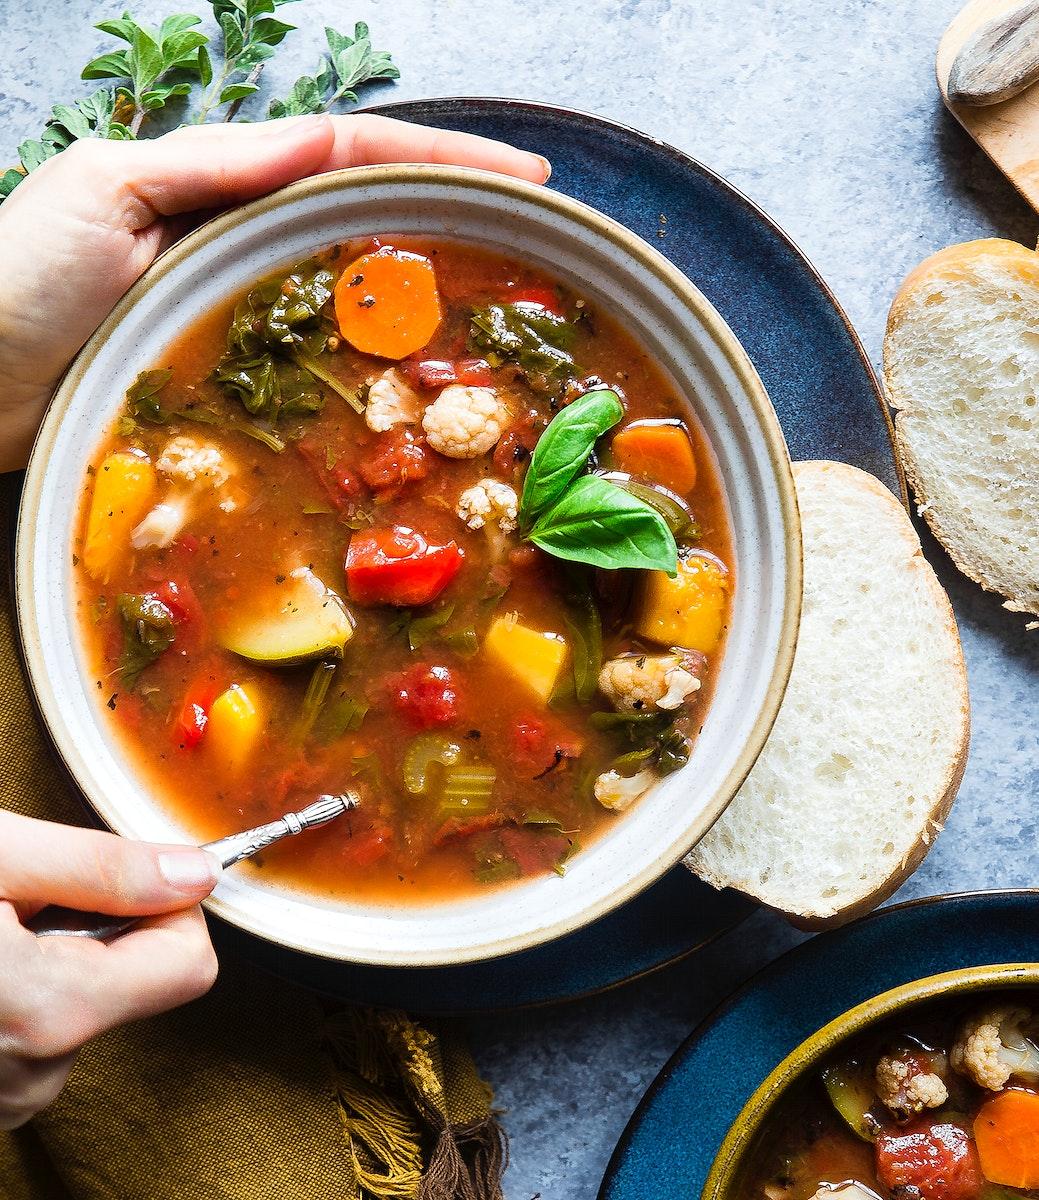 Homemade crockpot vegetable soup